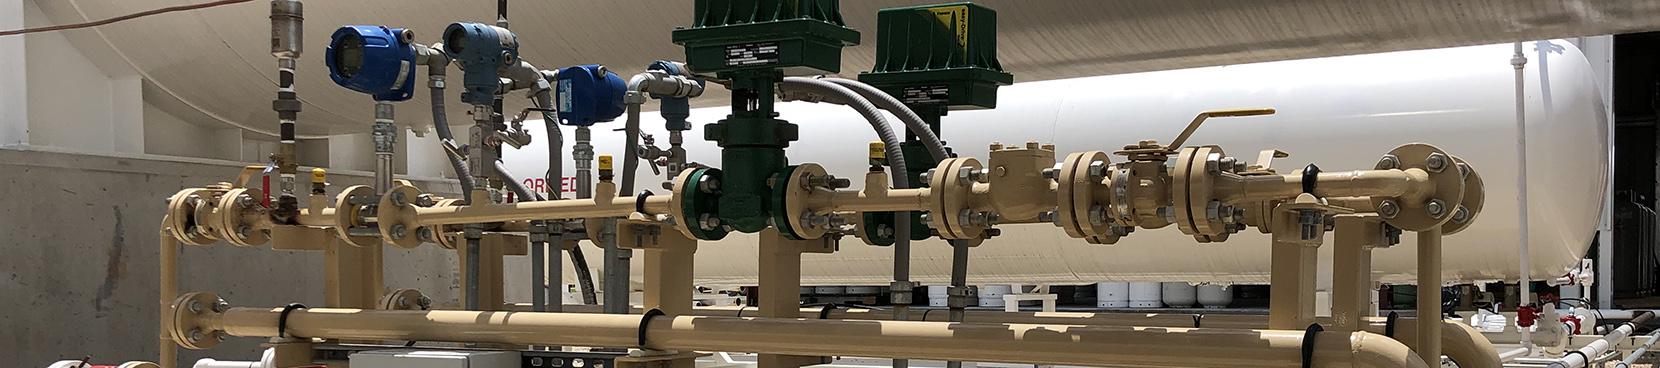 rDME-Propane Storage Tanks - Transfer Systems - Fuel Pumps - EPC